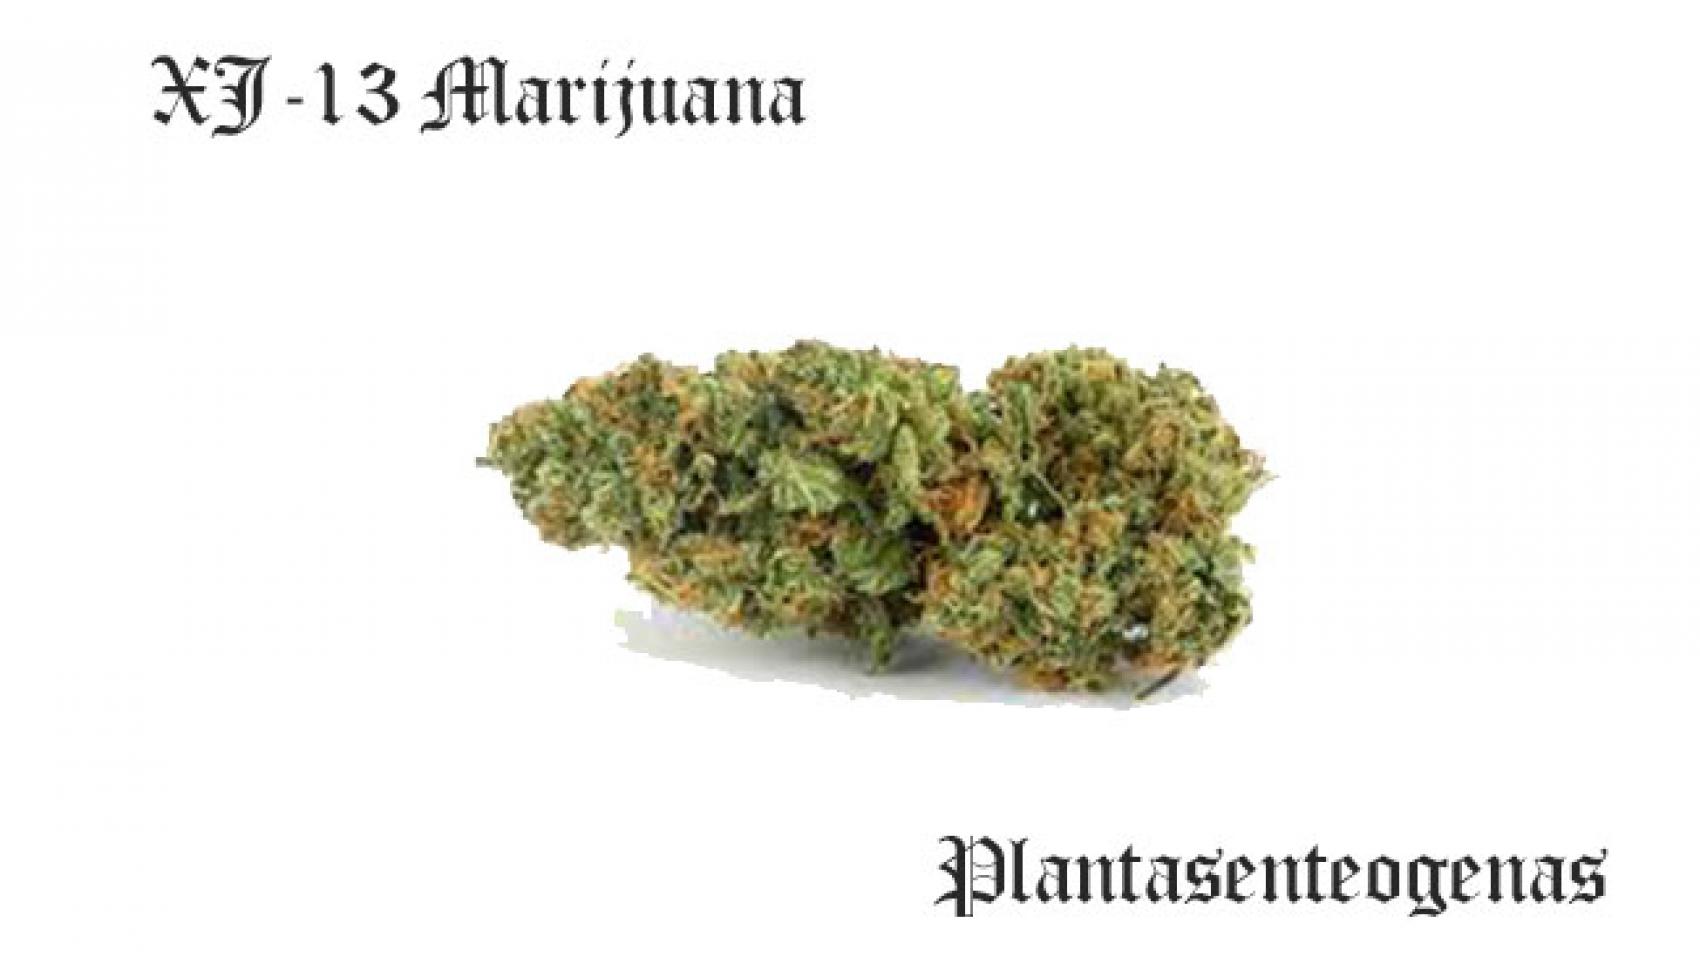 XJ-13 Marijuana